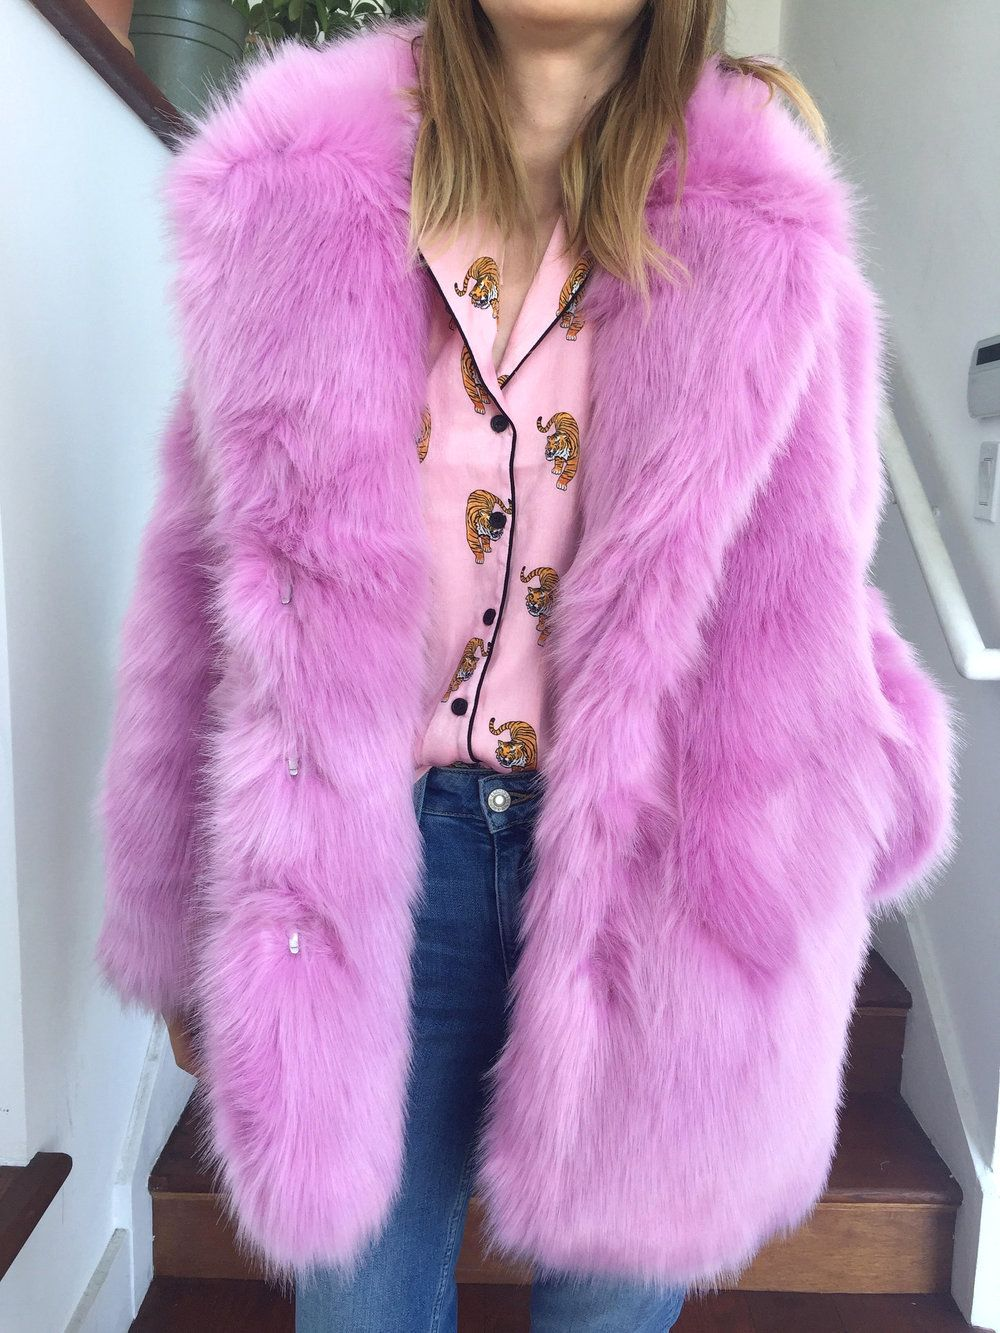 08ef8e5ccd59f Pink faux fur winter coat, HM pink faux fur coat, Gucci inspired pink faux  fur coat